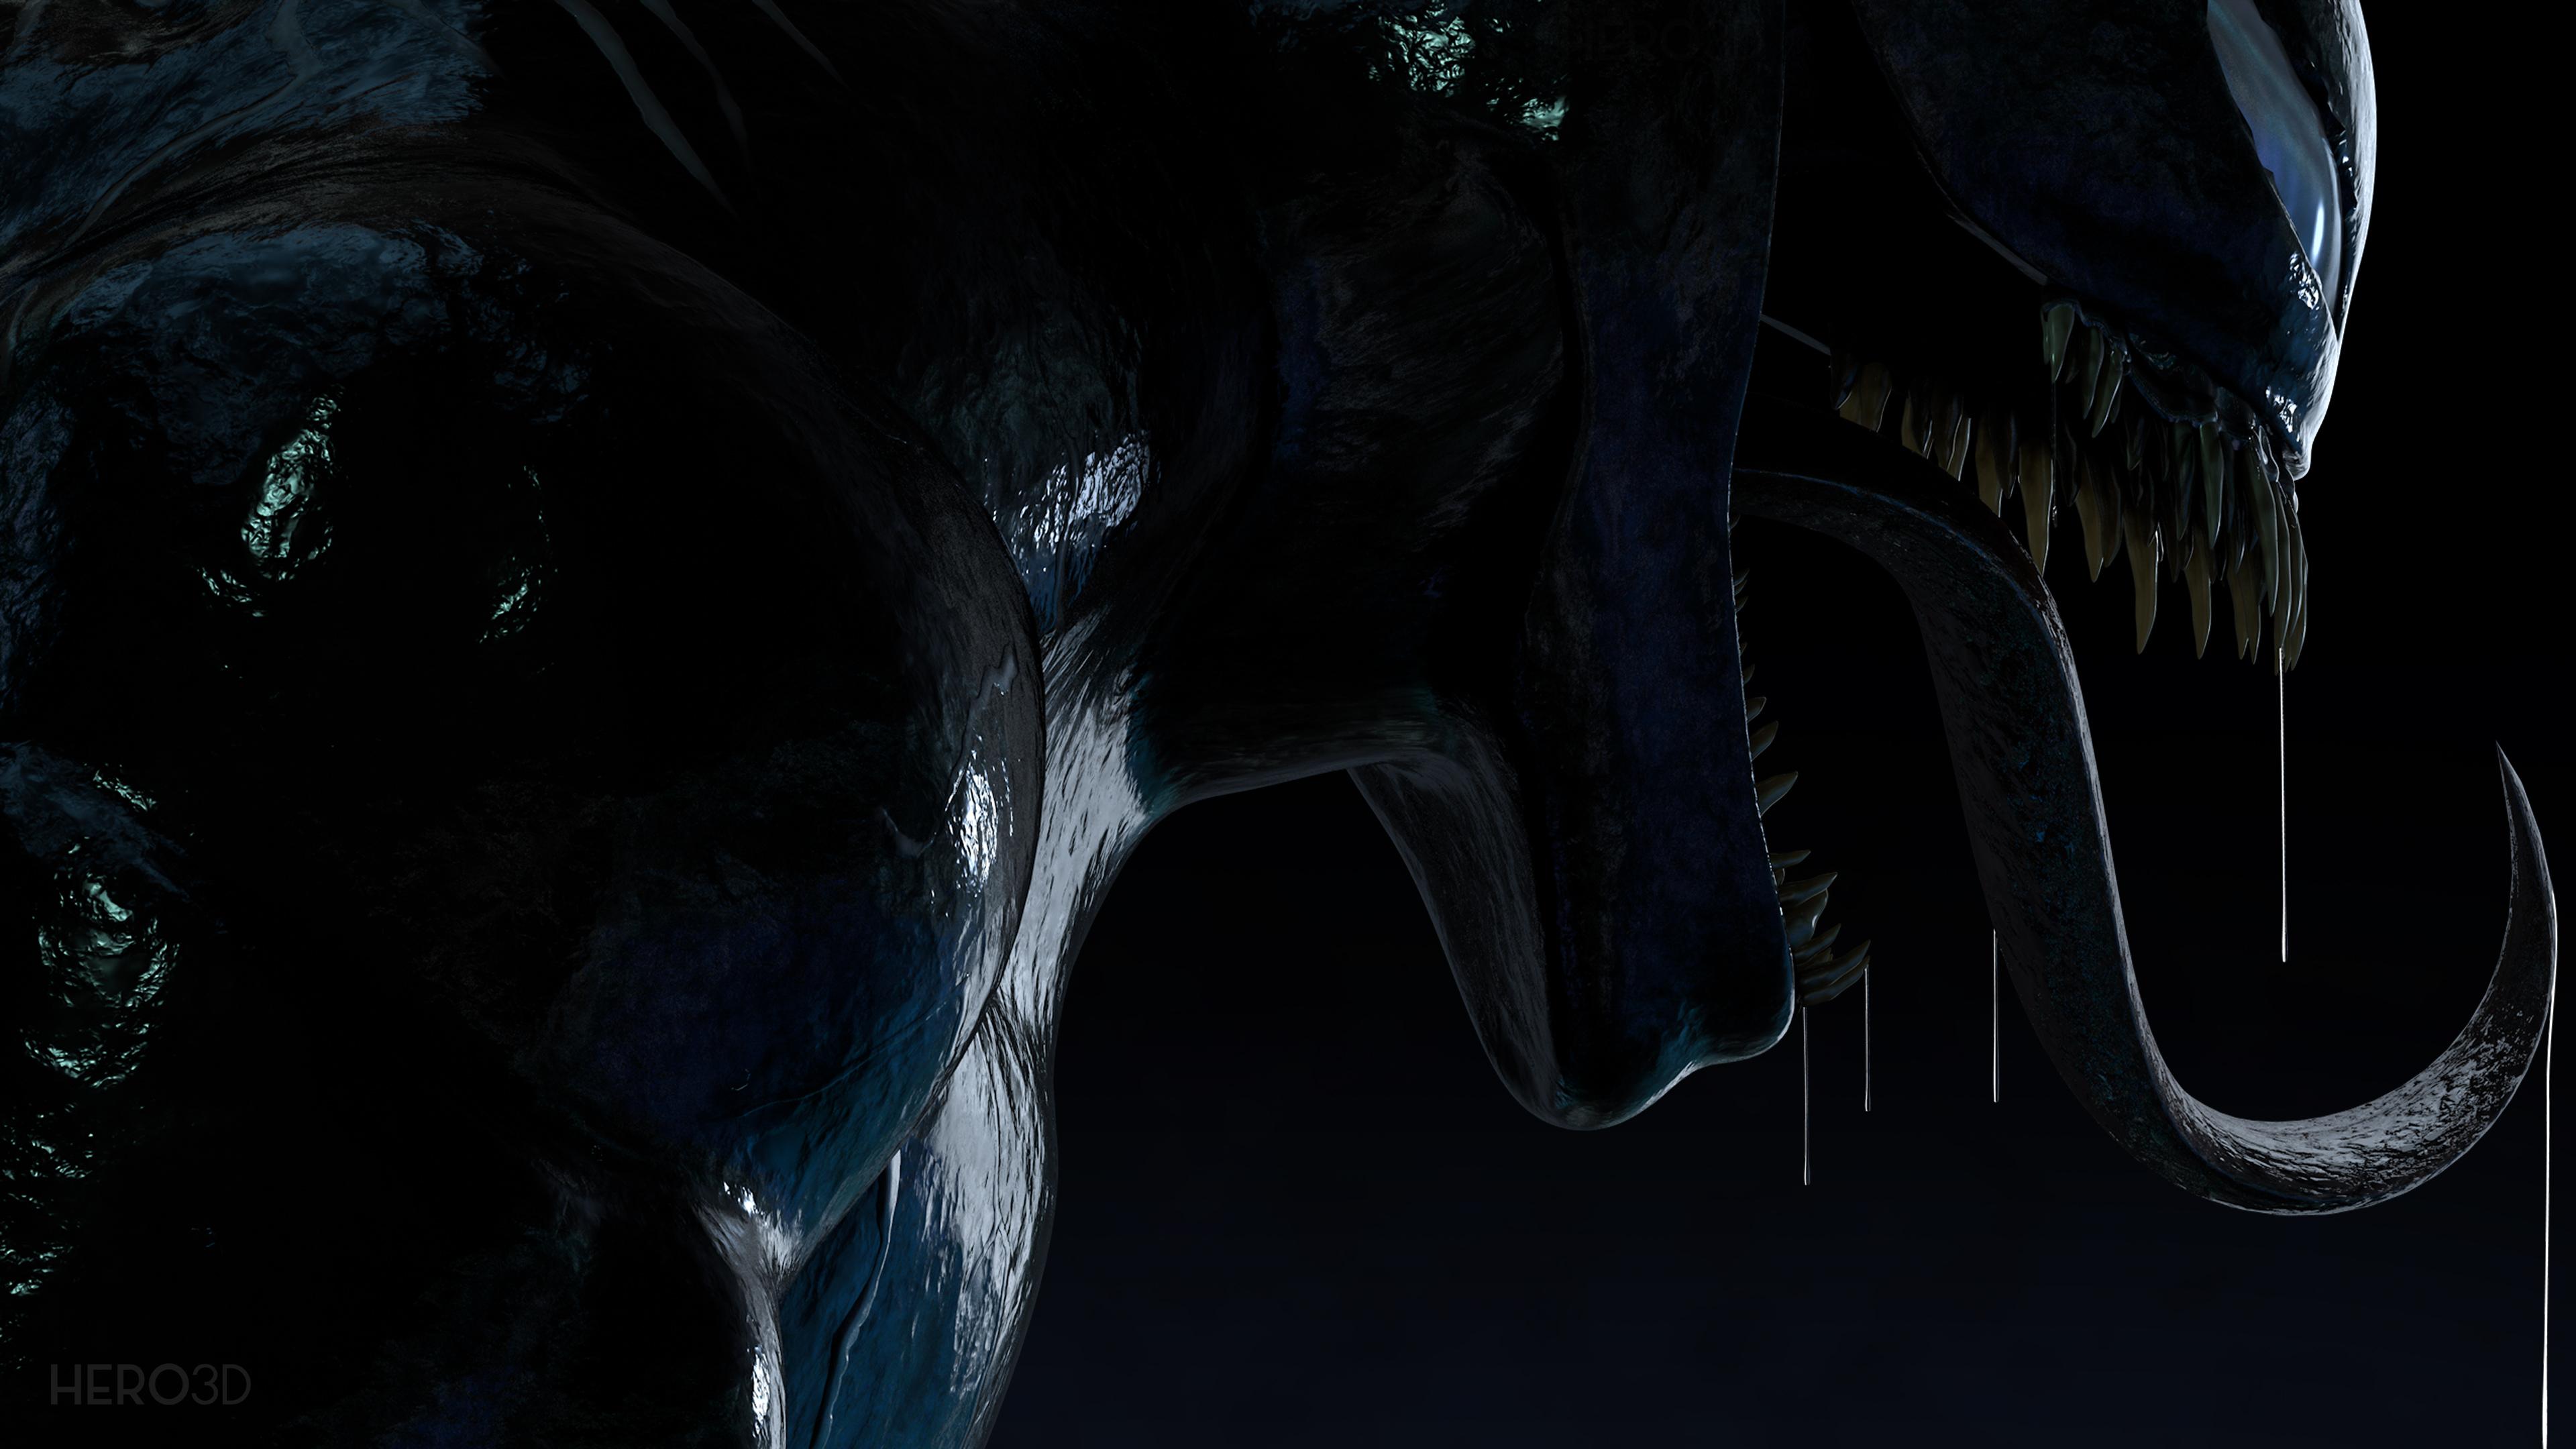 4k venom new digital artwork 1554244968 - 4k Venom New Digital Artwork - Venom wallpapers, supervillain wallpapers, superheroes wallpapers, hd-wallpapers, digital art wallpapers, deviantart wallpapers, artwork wallpapers, 4k-wallpapers